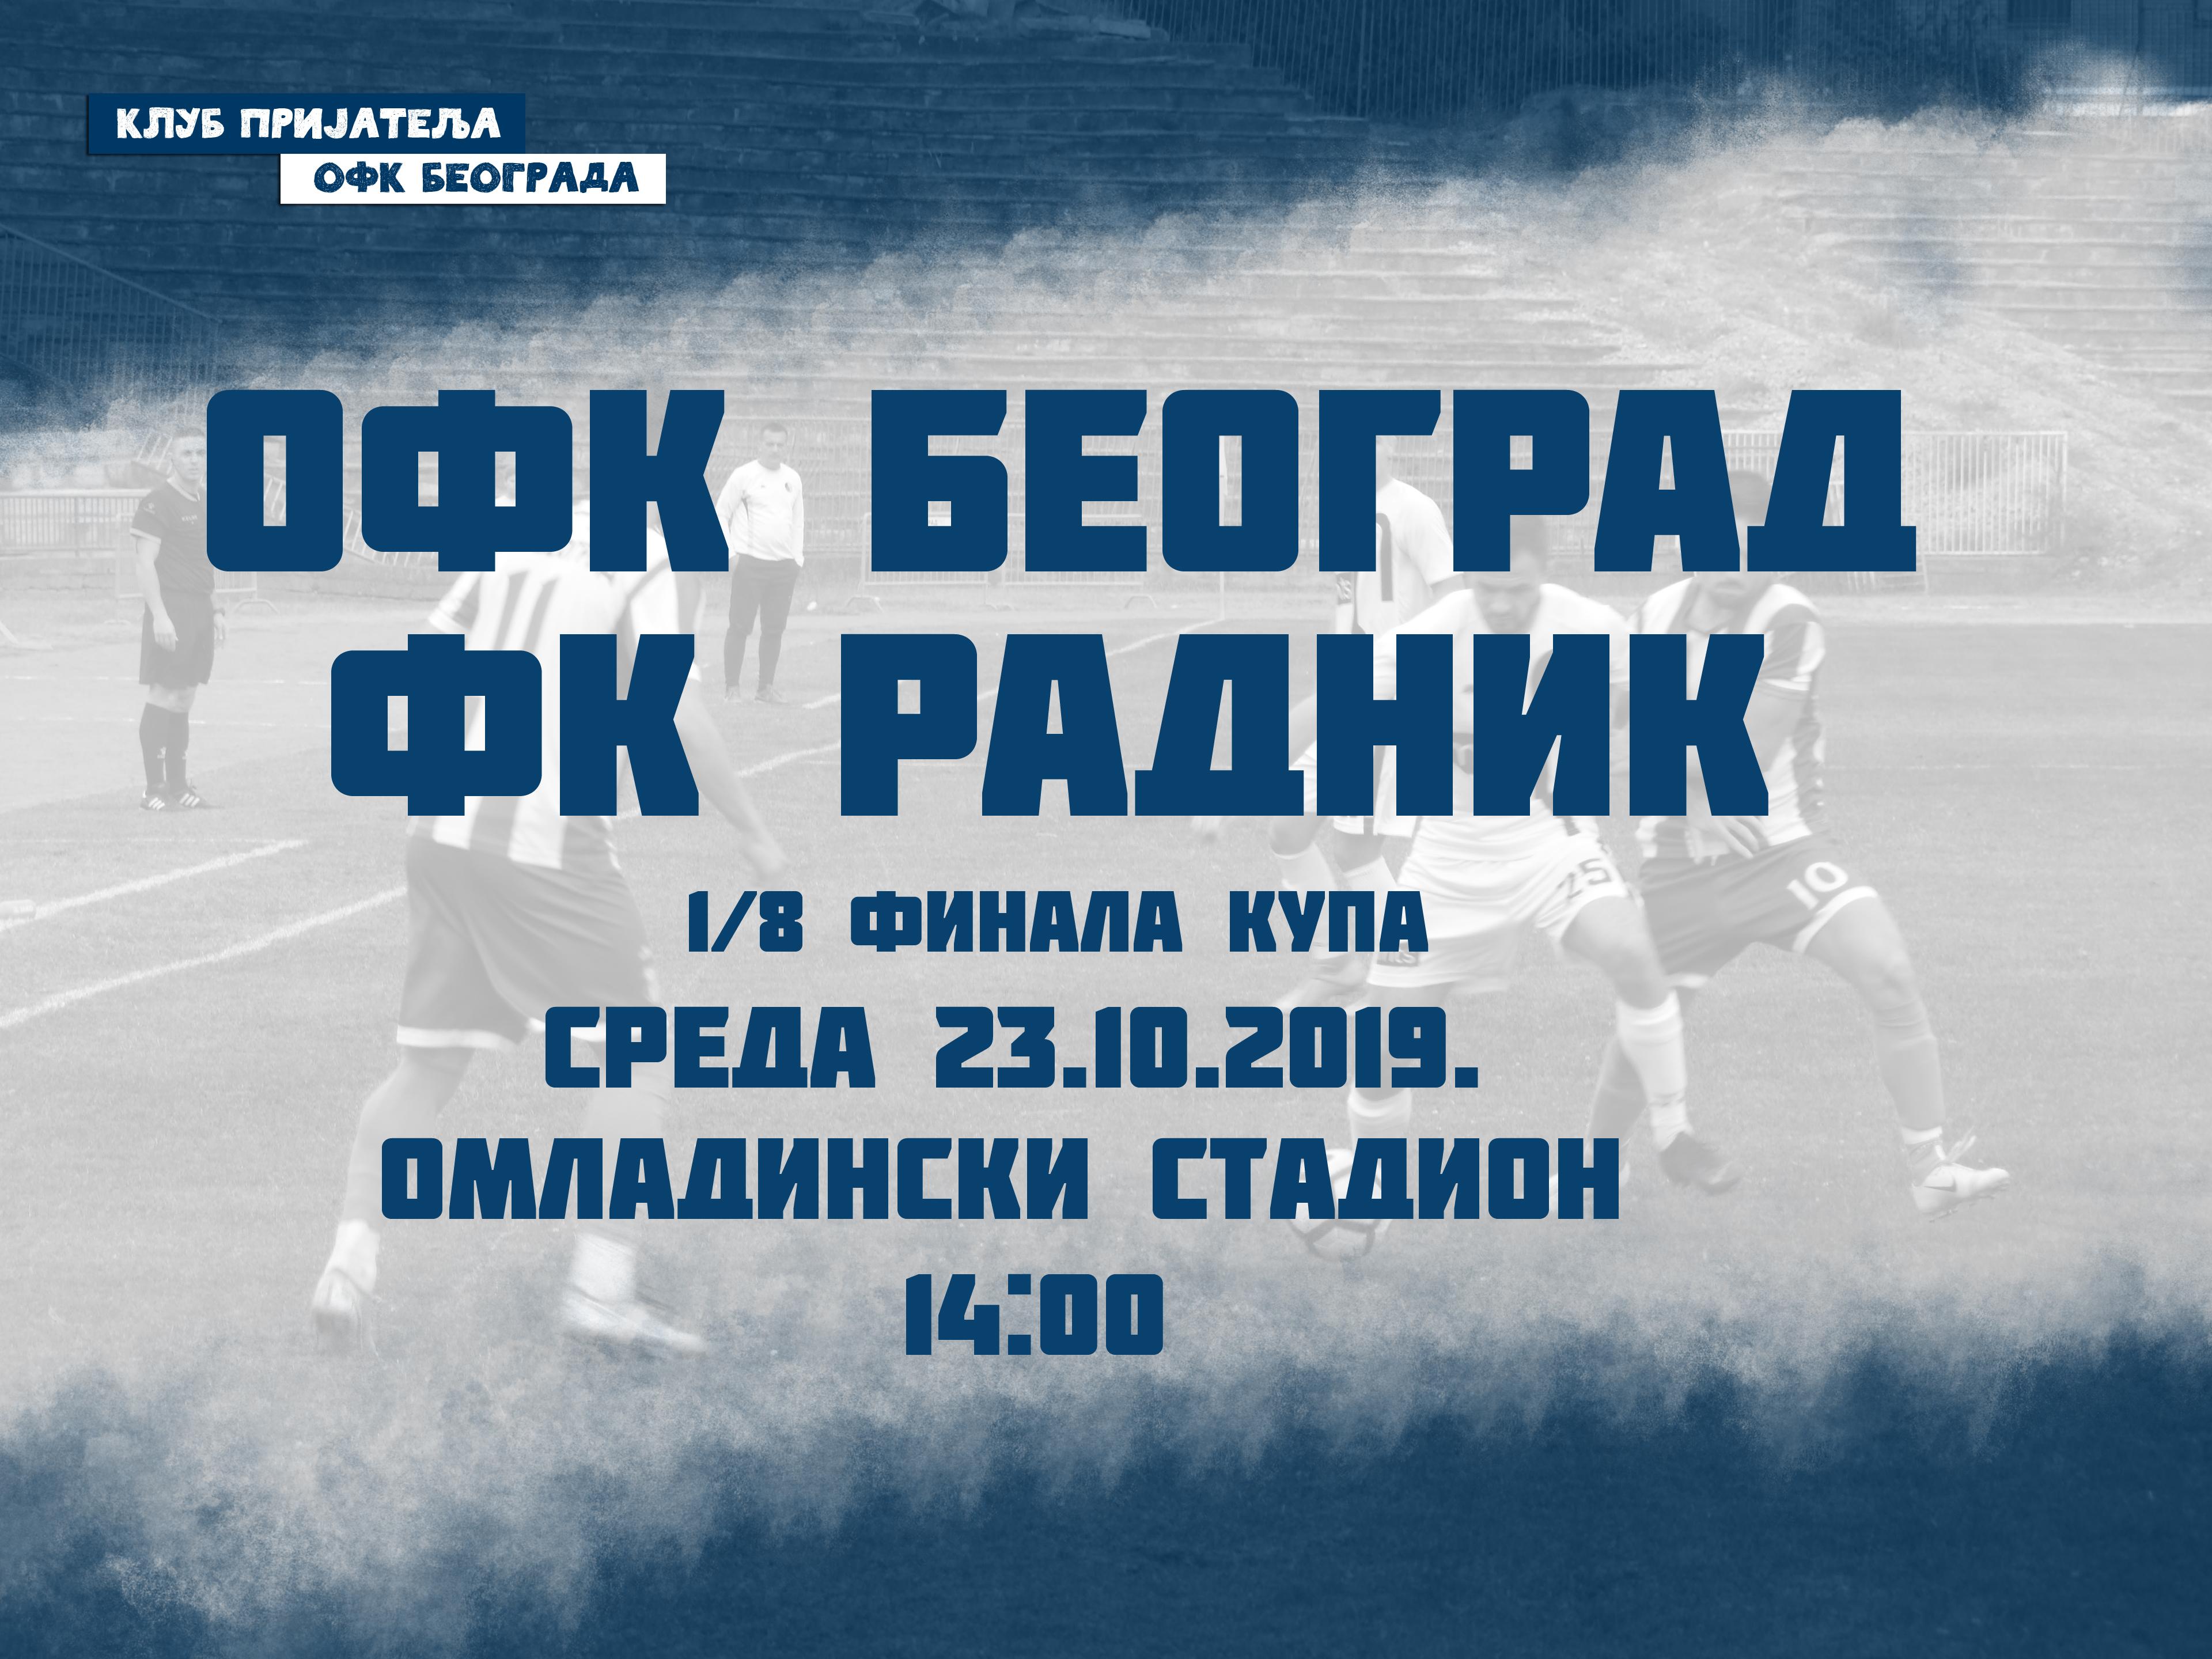 ОФК Београд – ФК Радник, 1/8 финала купа